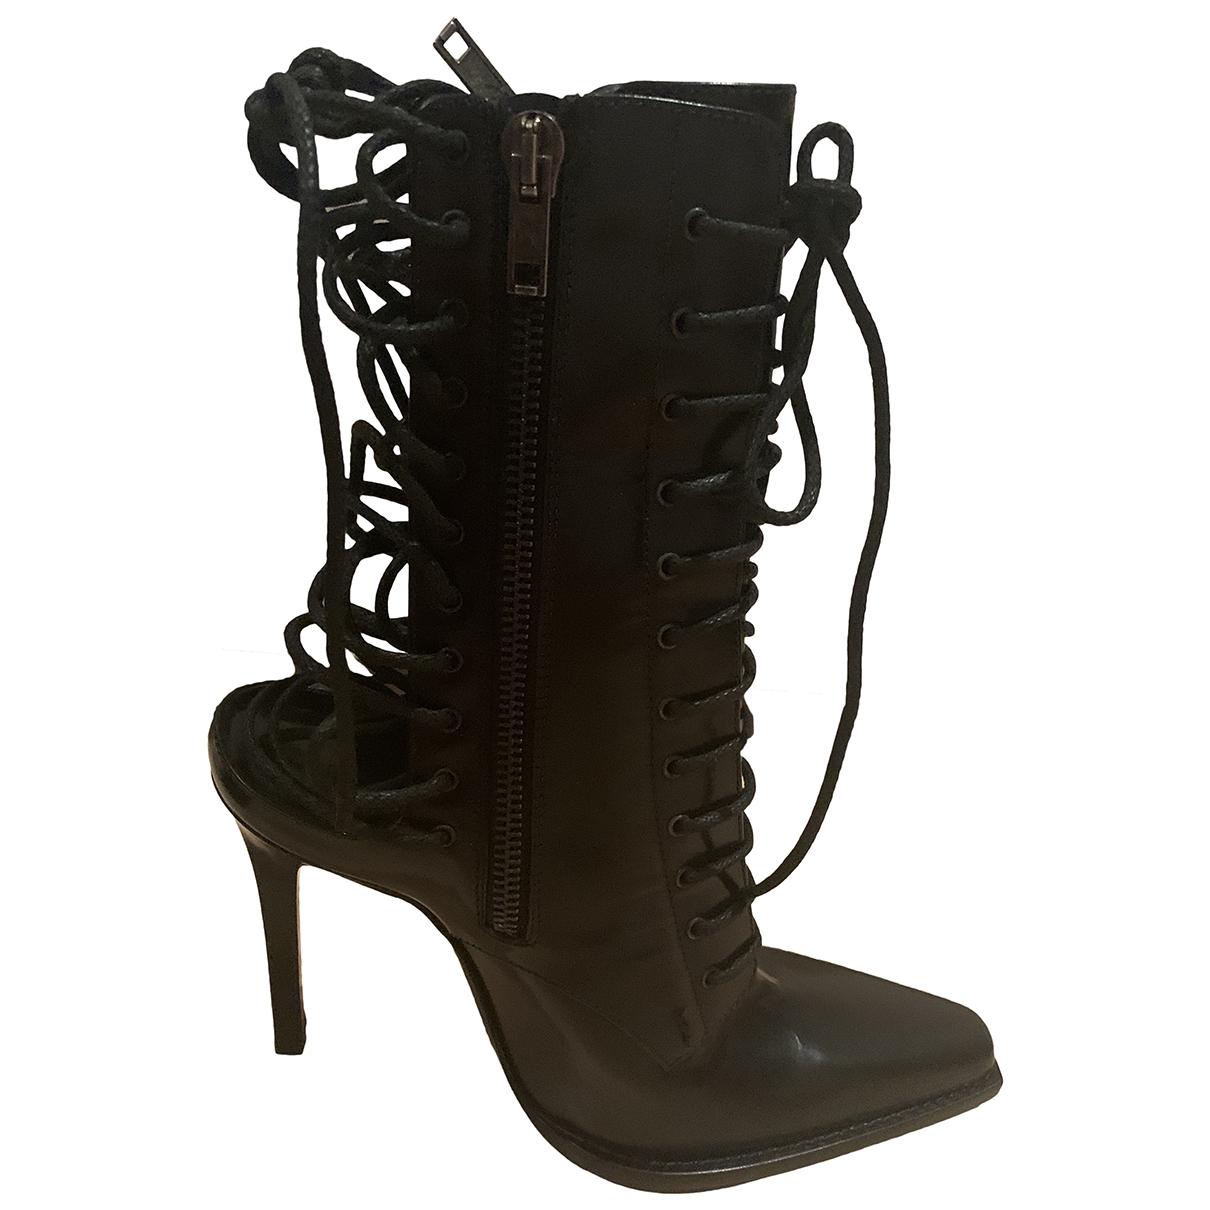 Haider Ackermann - Bottes   pour femme en cuir - noir